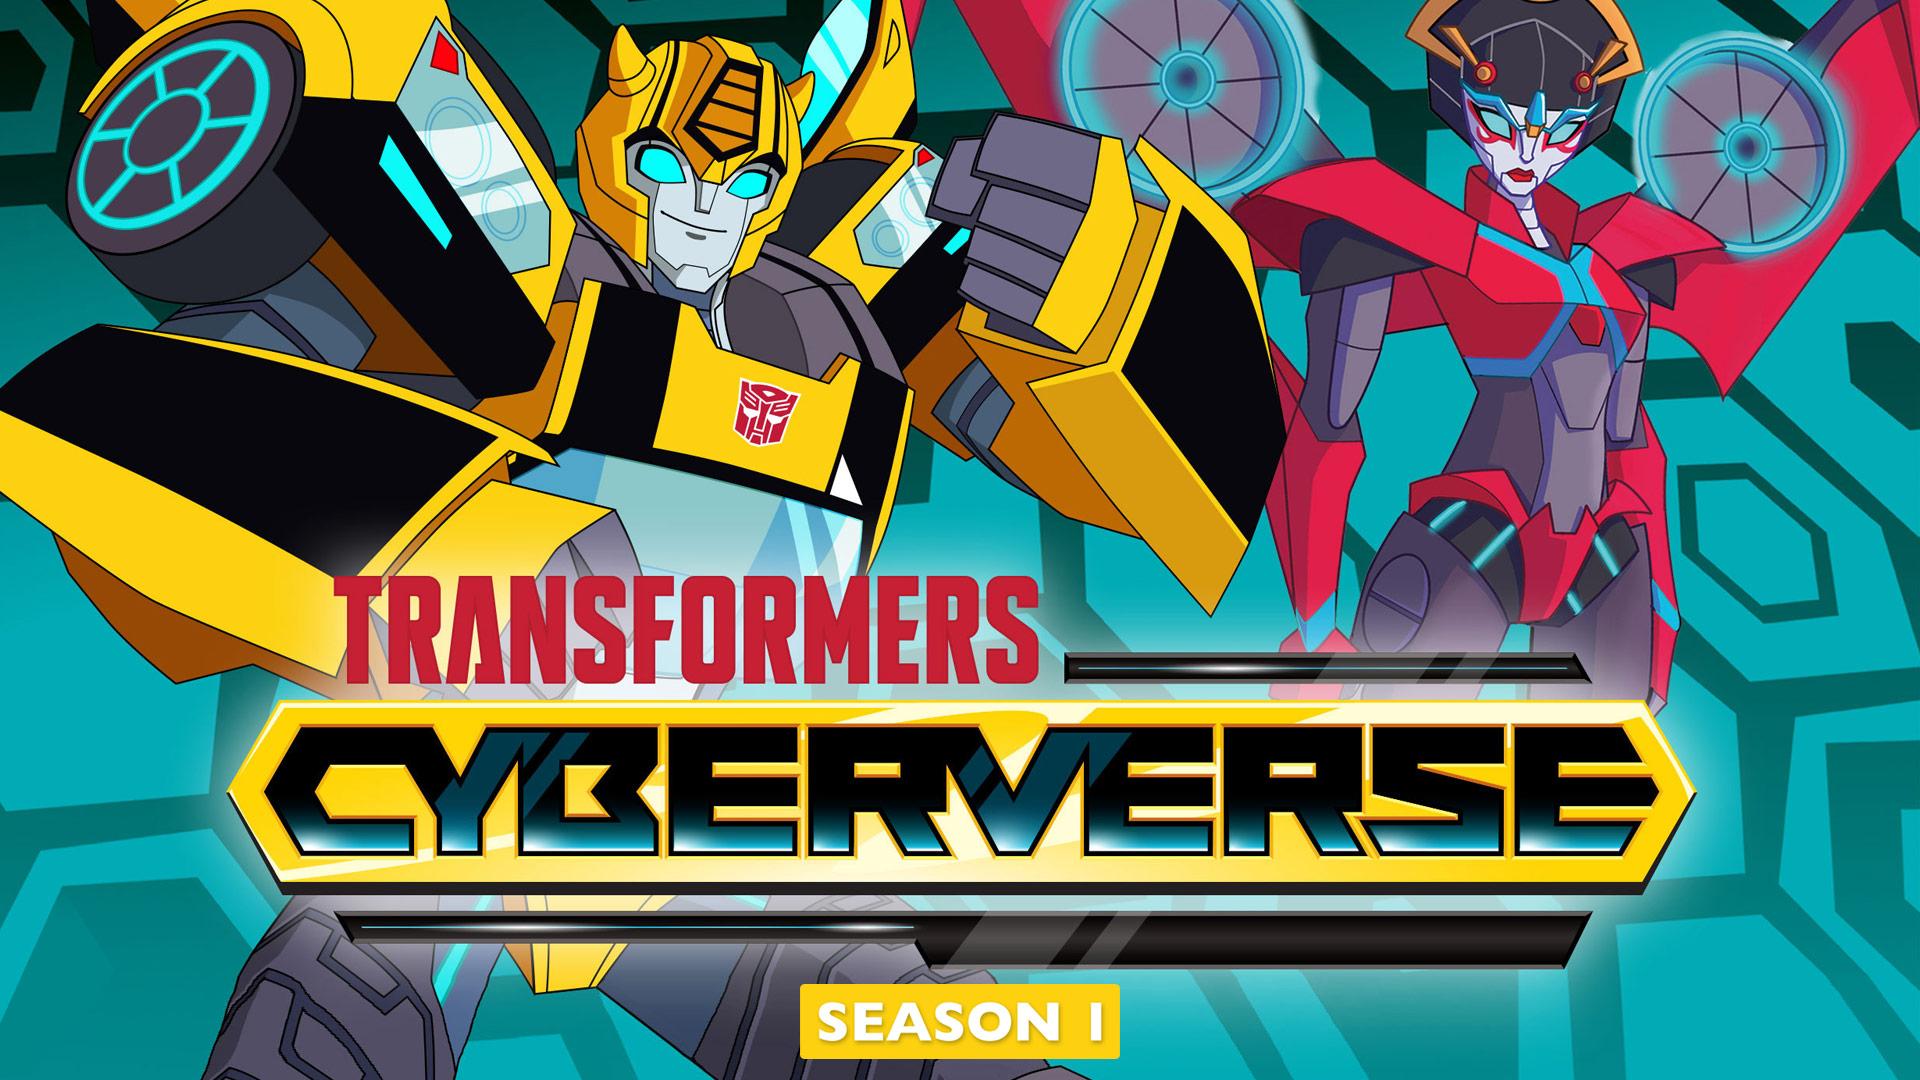 Transformers Cyberverse Season 1